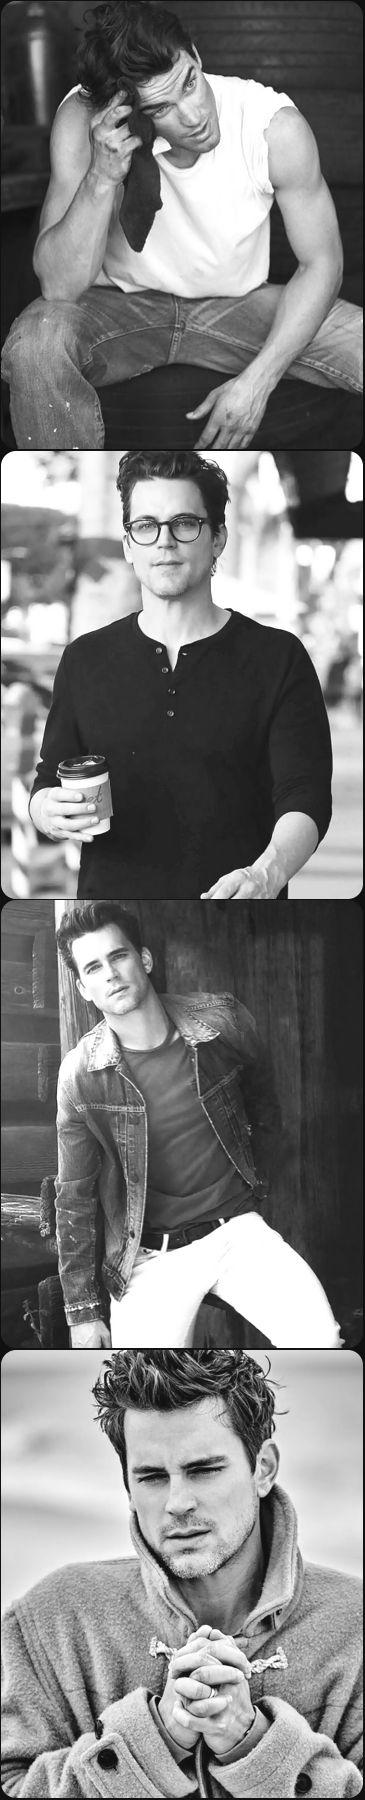 Matt Bomer, Men's Fashion, Actor, Male Model, Good Looking, Beautiful Man, Guy, Handsome, Cute, Hot, Sexy, Eye Candy, Muscle, Fitness, Gay マット・ボマー メンズファッション 俳優 男性モデル フィットネス ゲイ